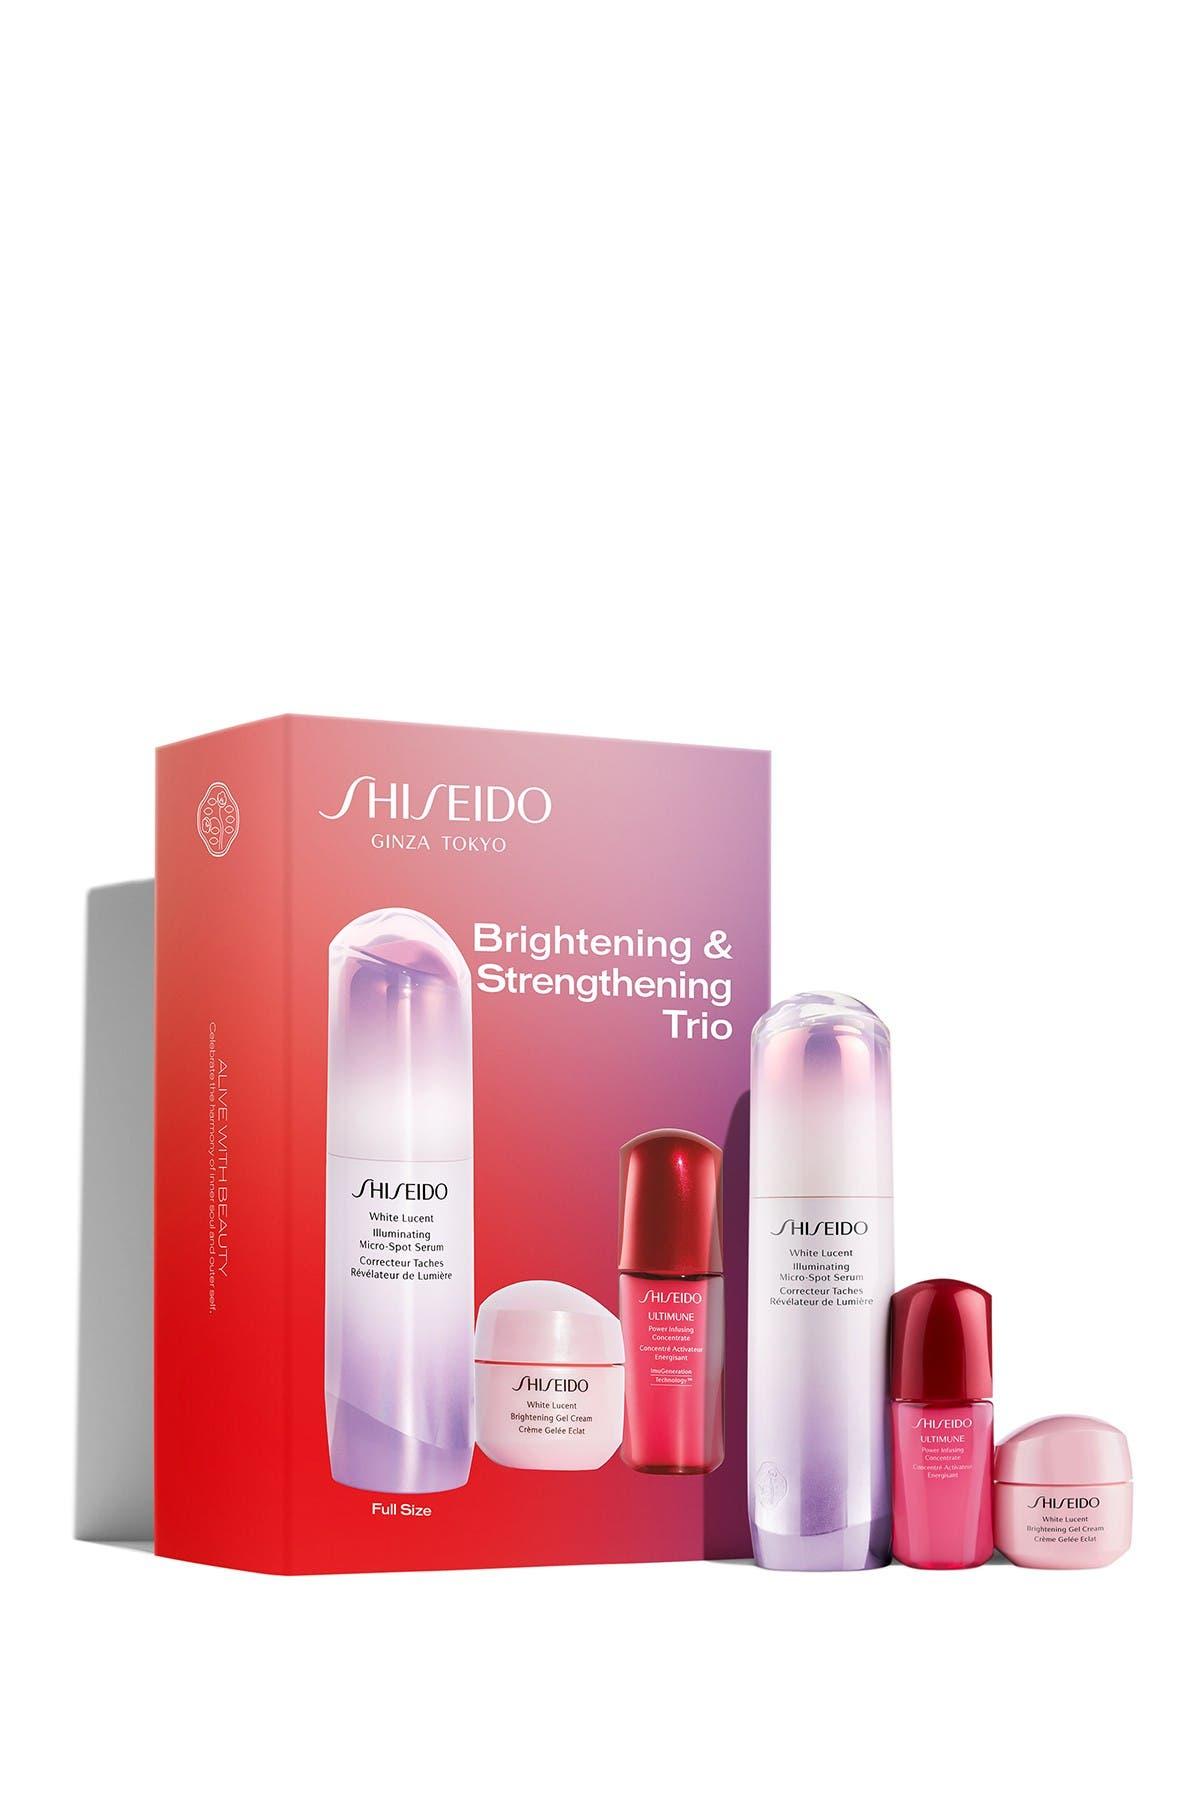 Image of Shiseido Ginza Tokyo Brightening + Strengthening Trio